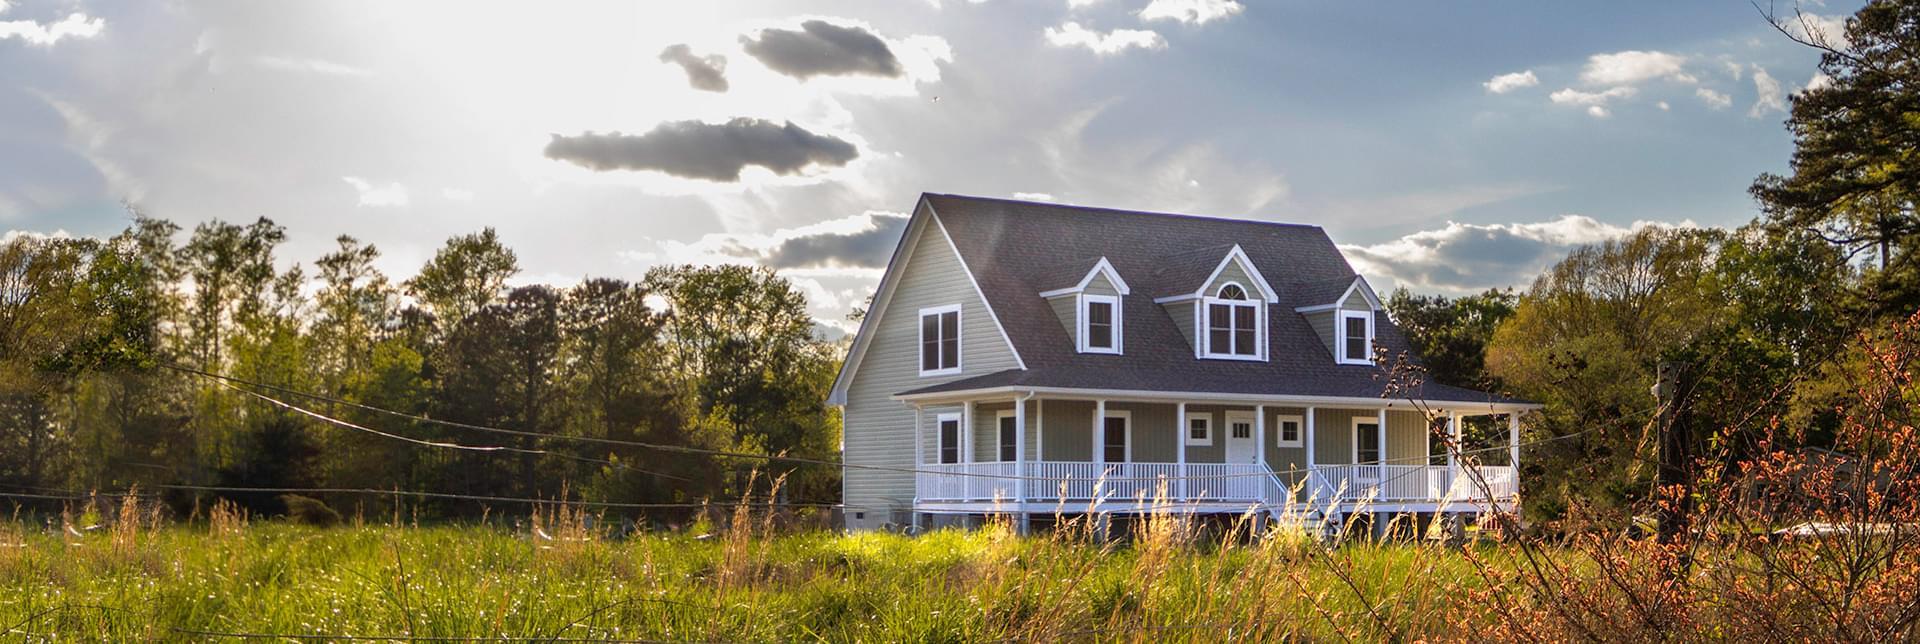 New Homes in James City County VA